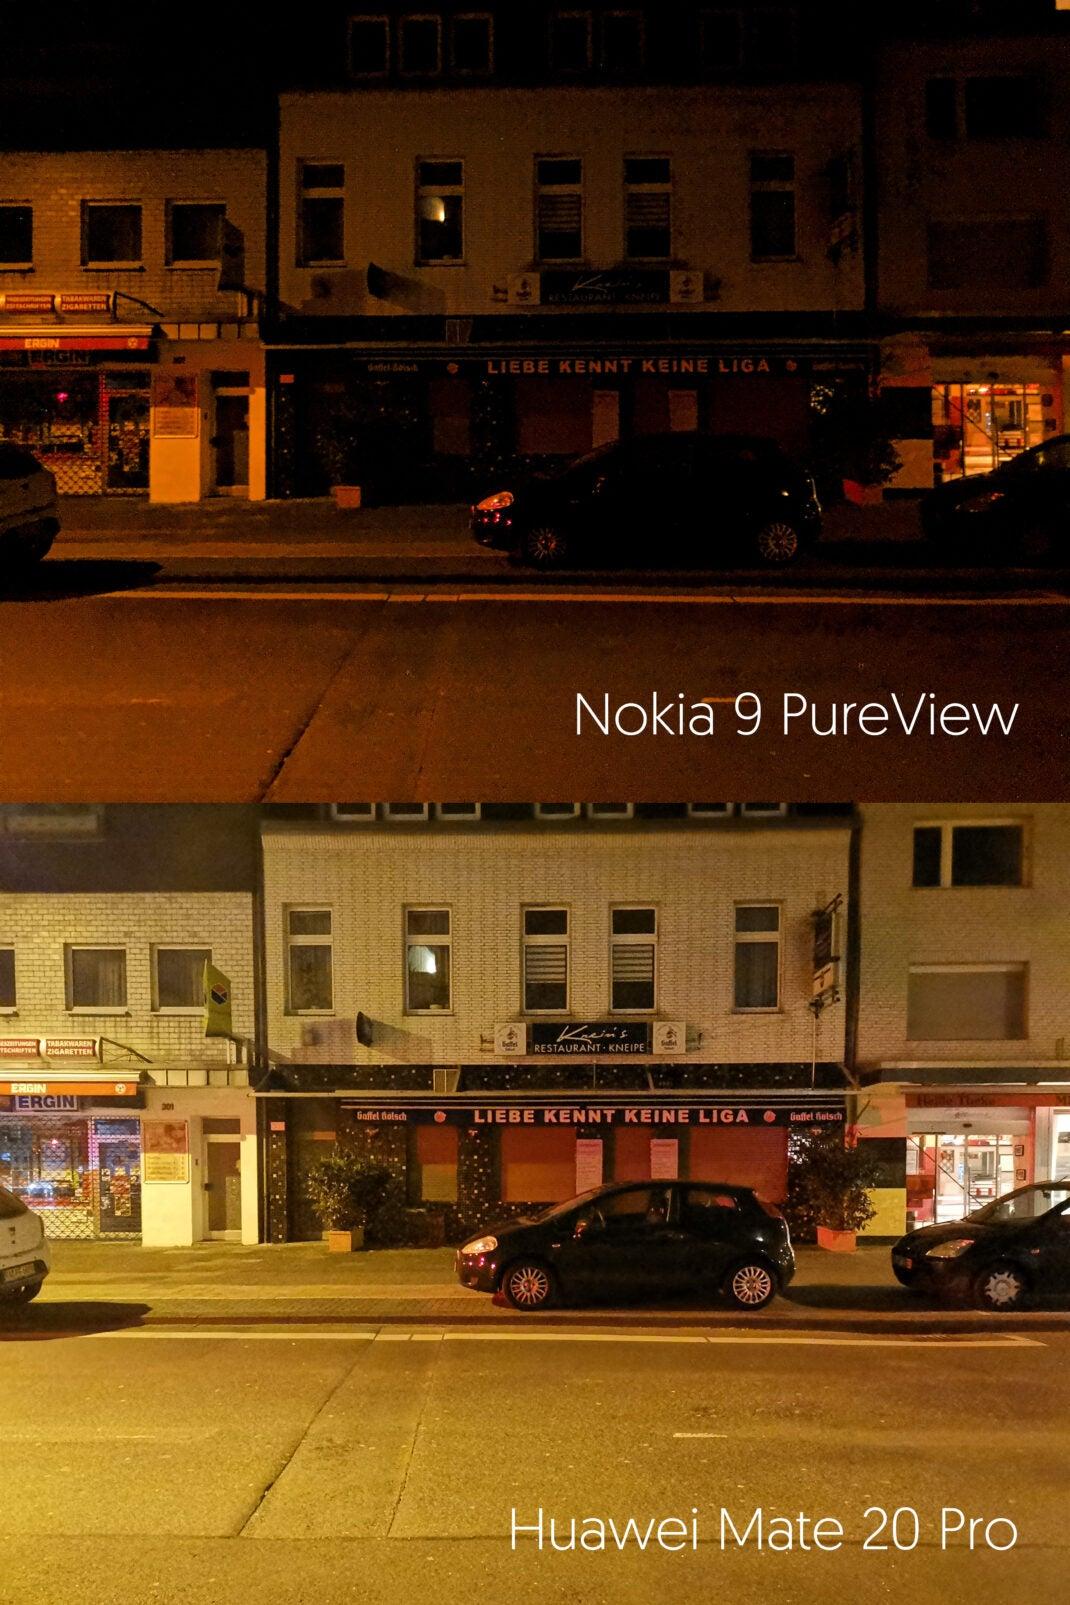 Nachtaufnahme: Vergleich Nokia 9 PureView vs. Huawei Mate 20 Pro